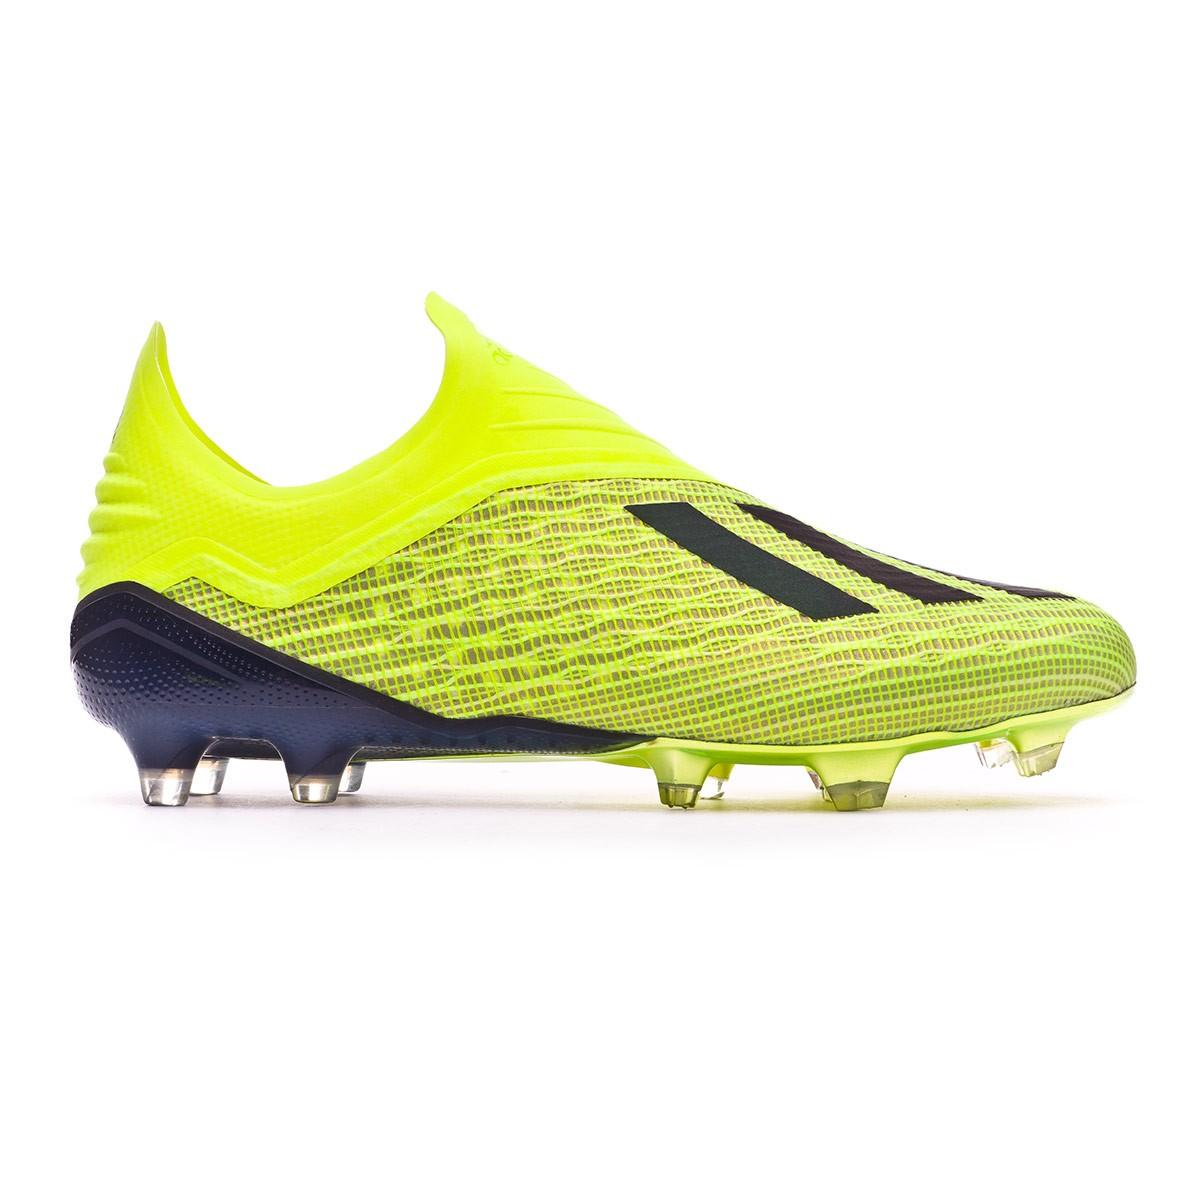 7113f43d4 Football Boots adidas X 18+ FG Solar yellow-Core black-White - Football  store Fútbol Emotion